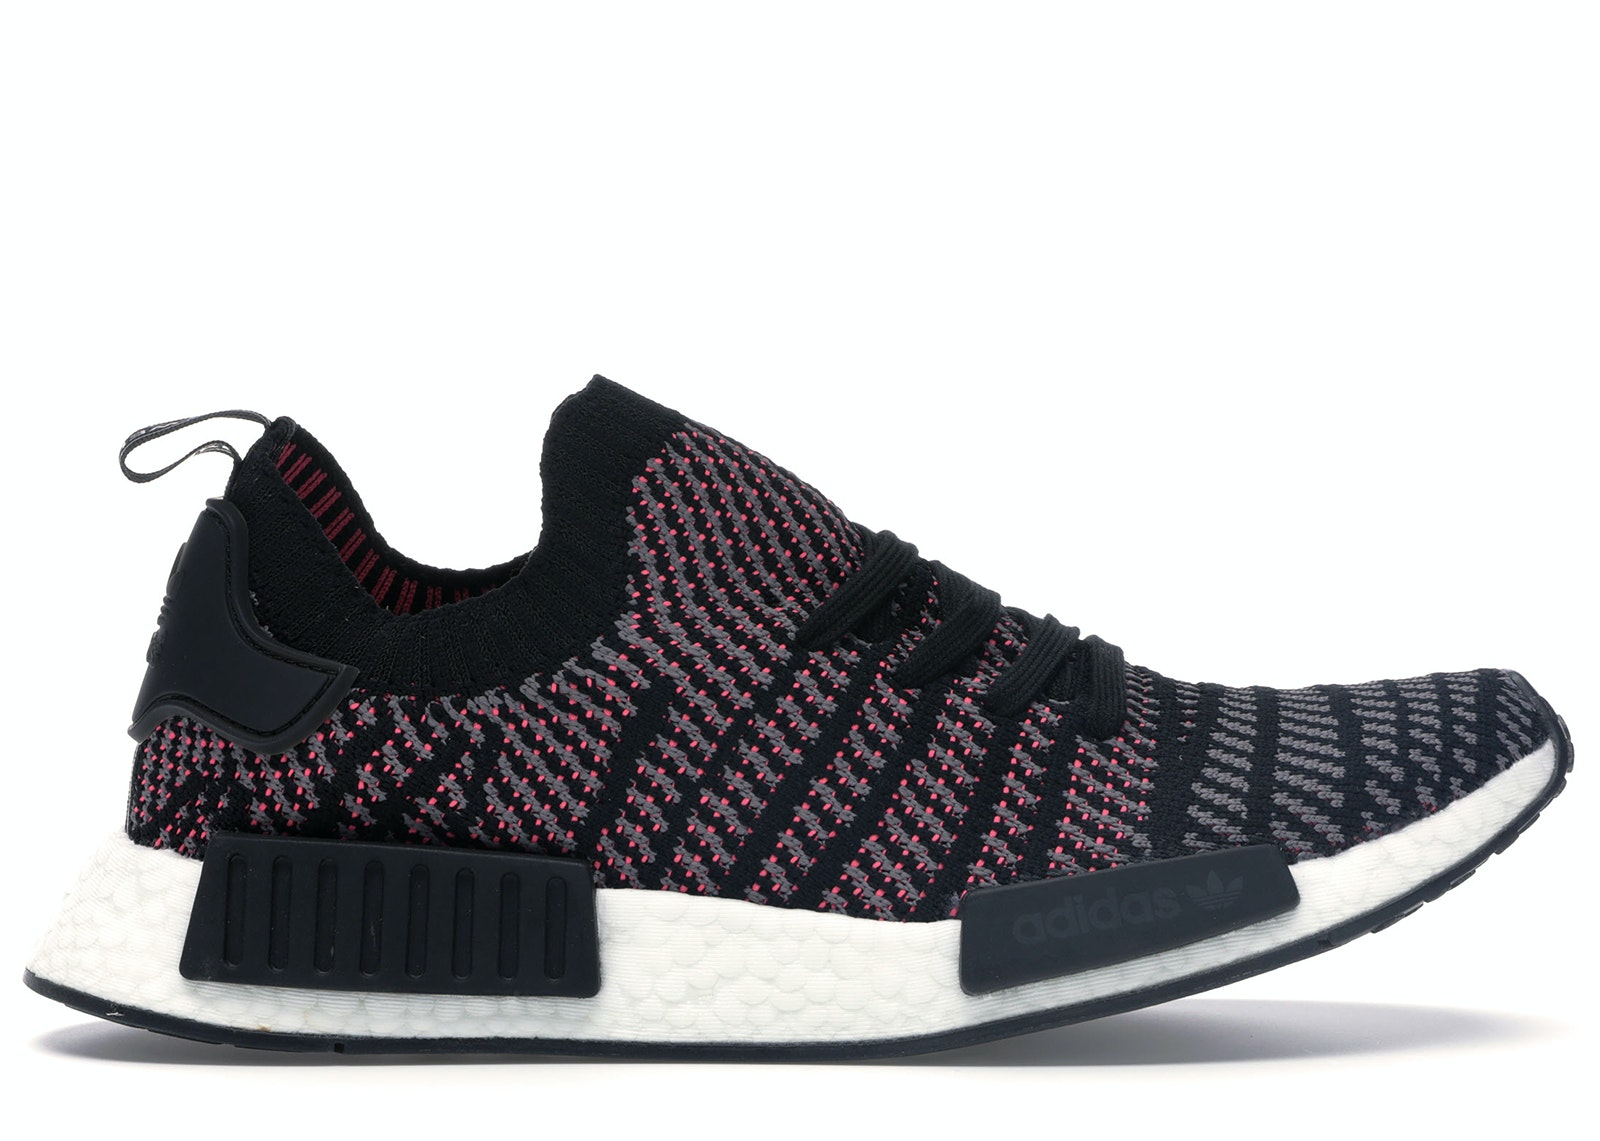 adidas NMD R1 STLT Black Grey Solar Pink